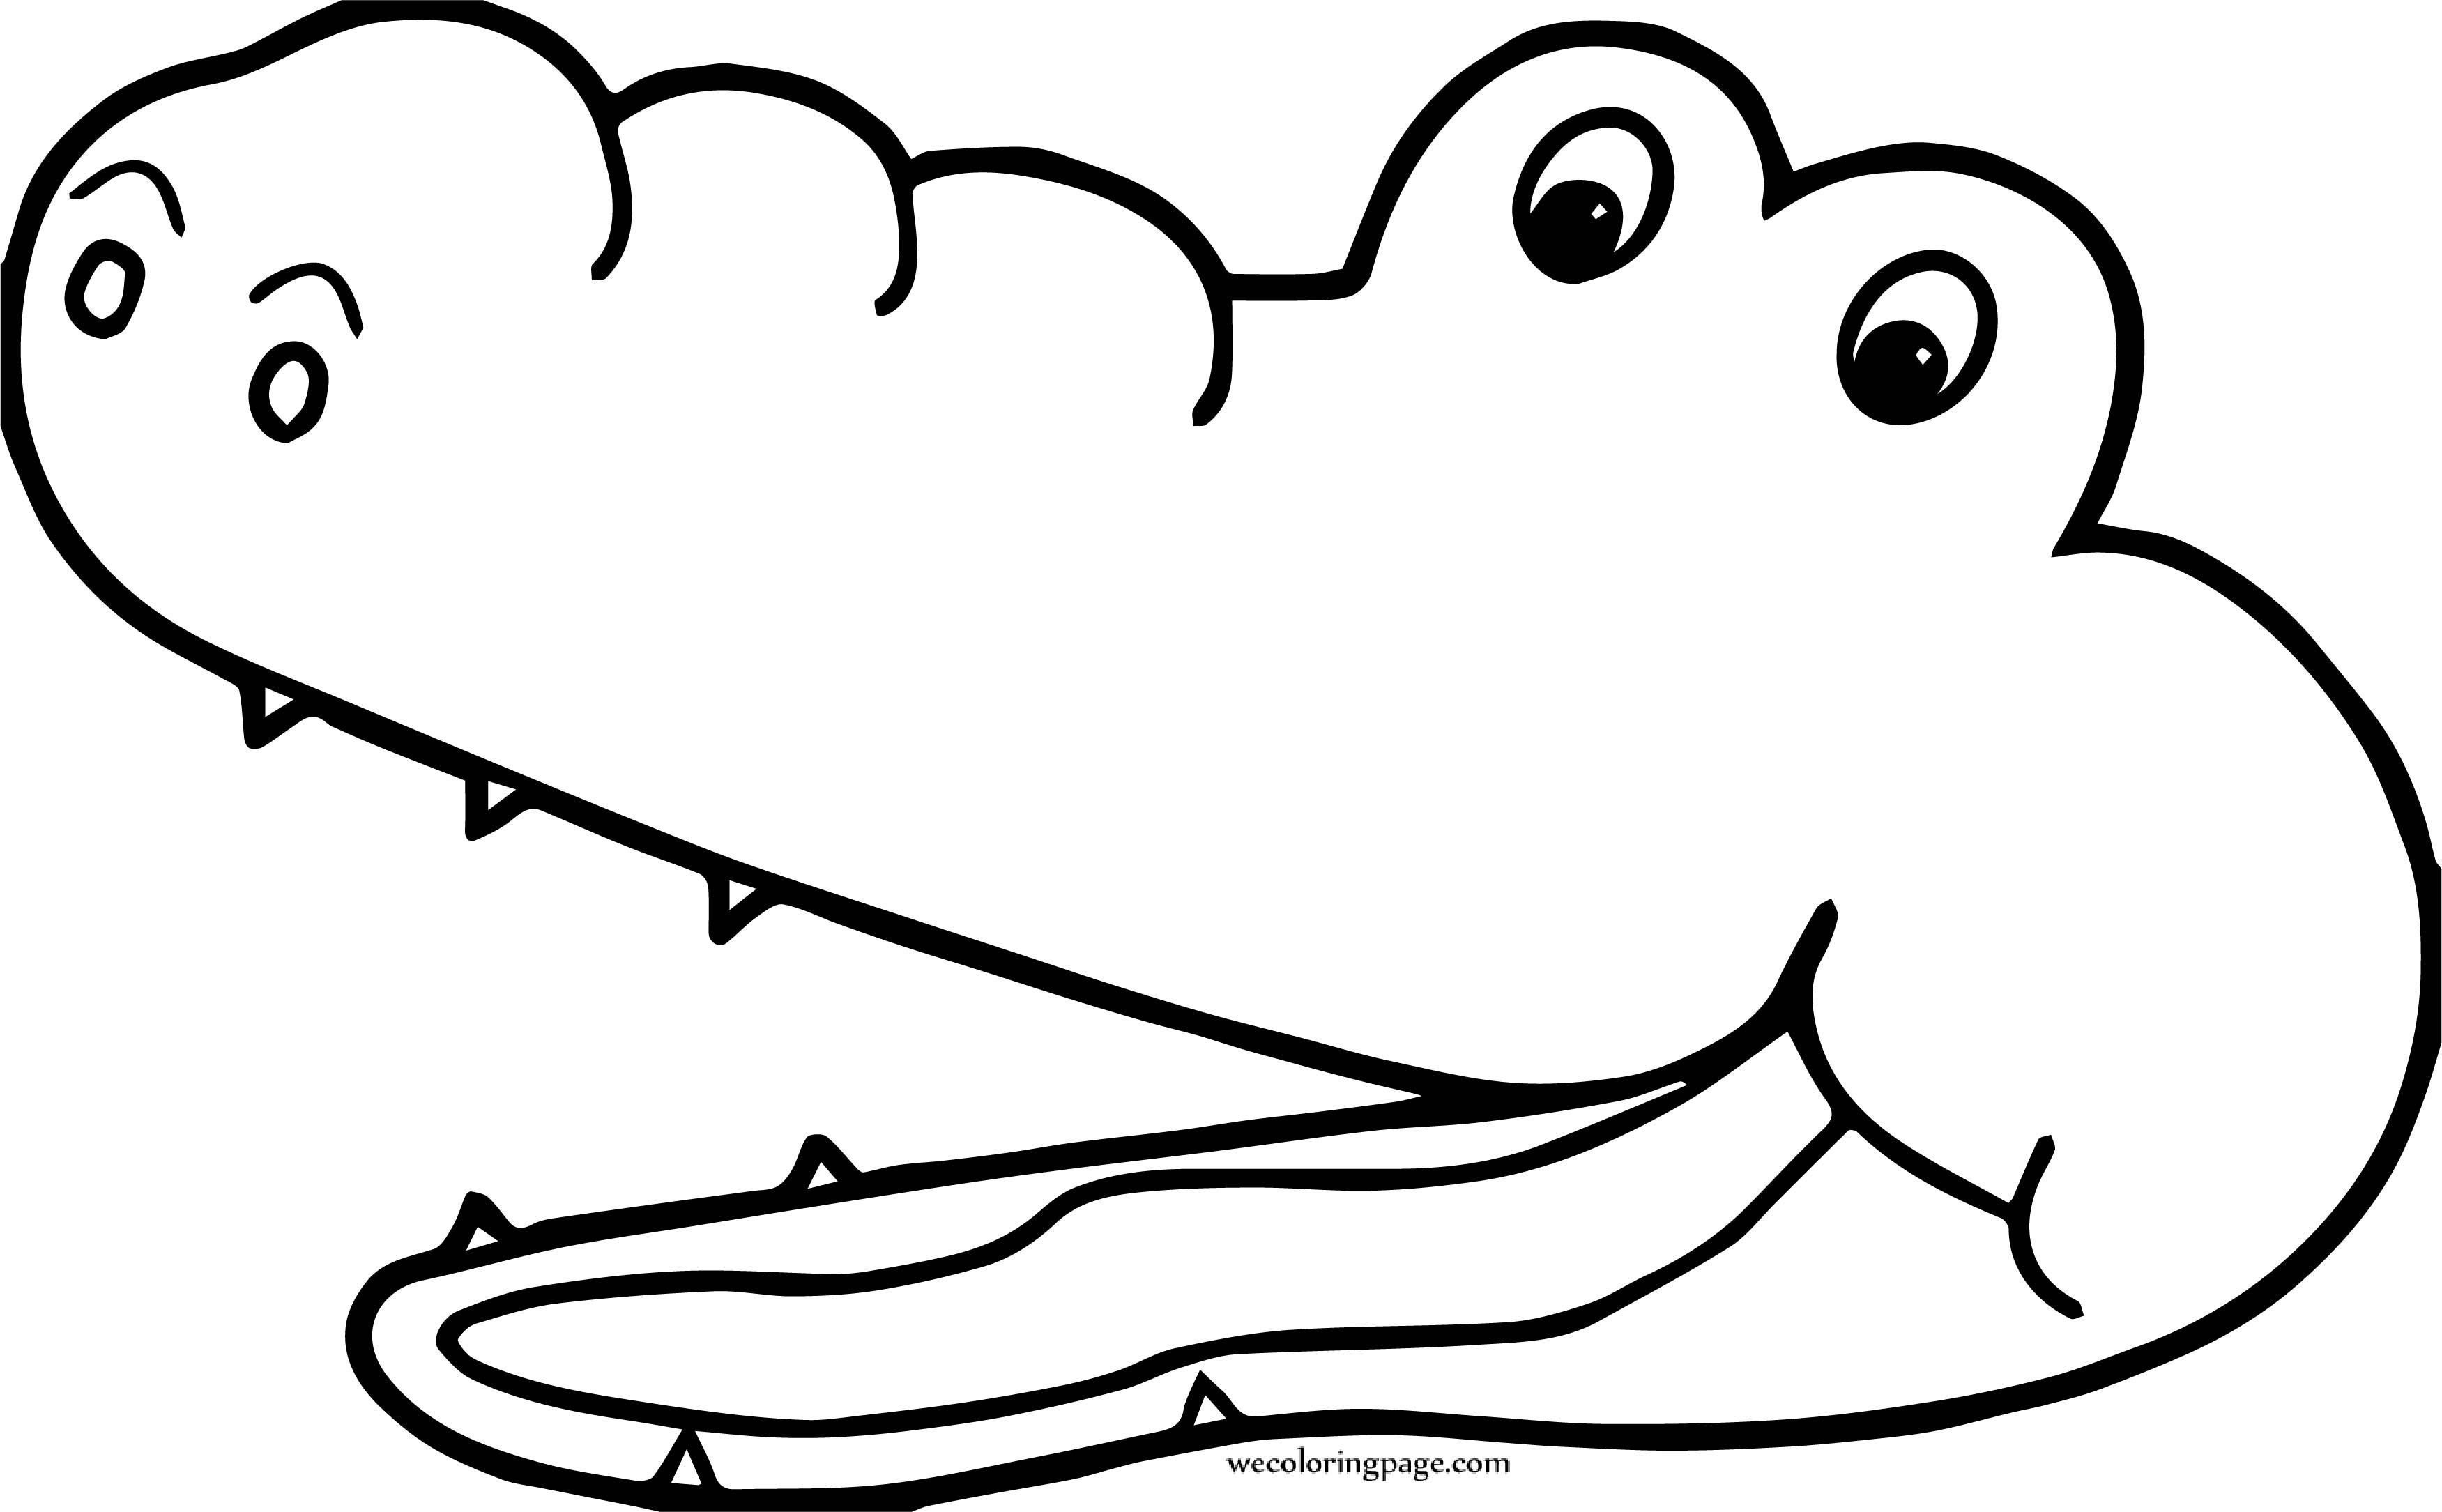 Crocodile Alligator Face Coloring Page